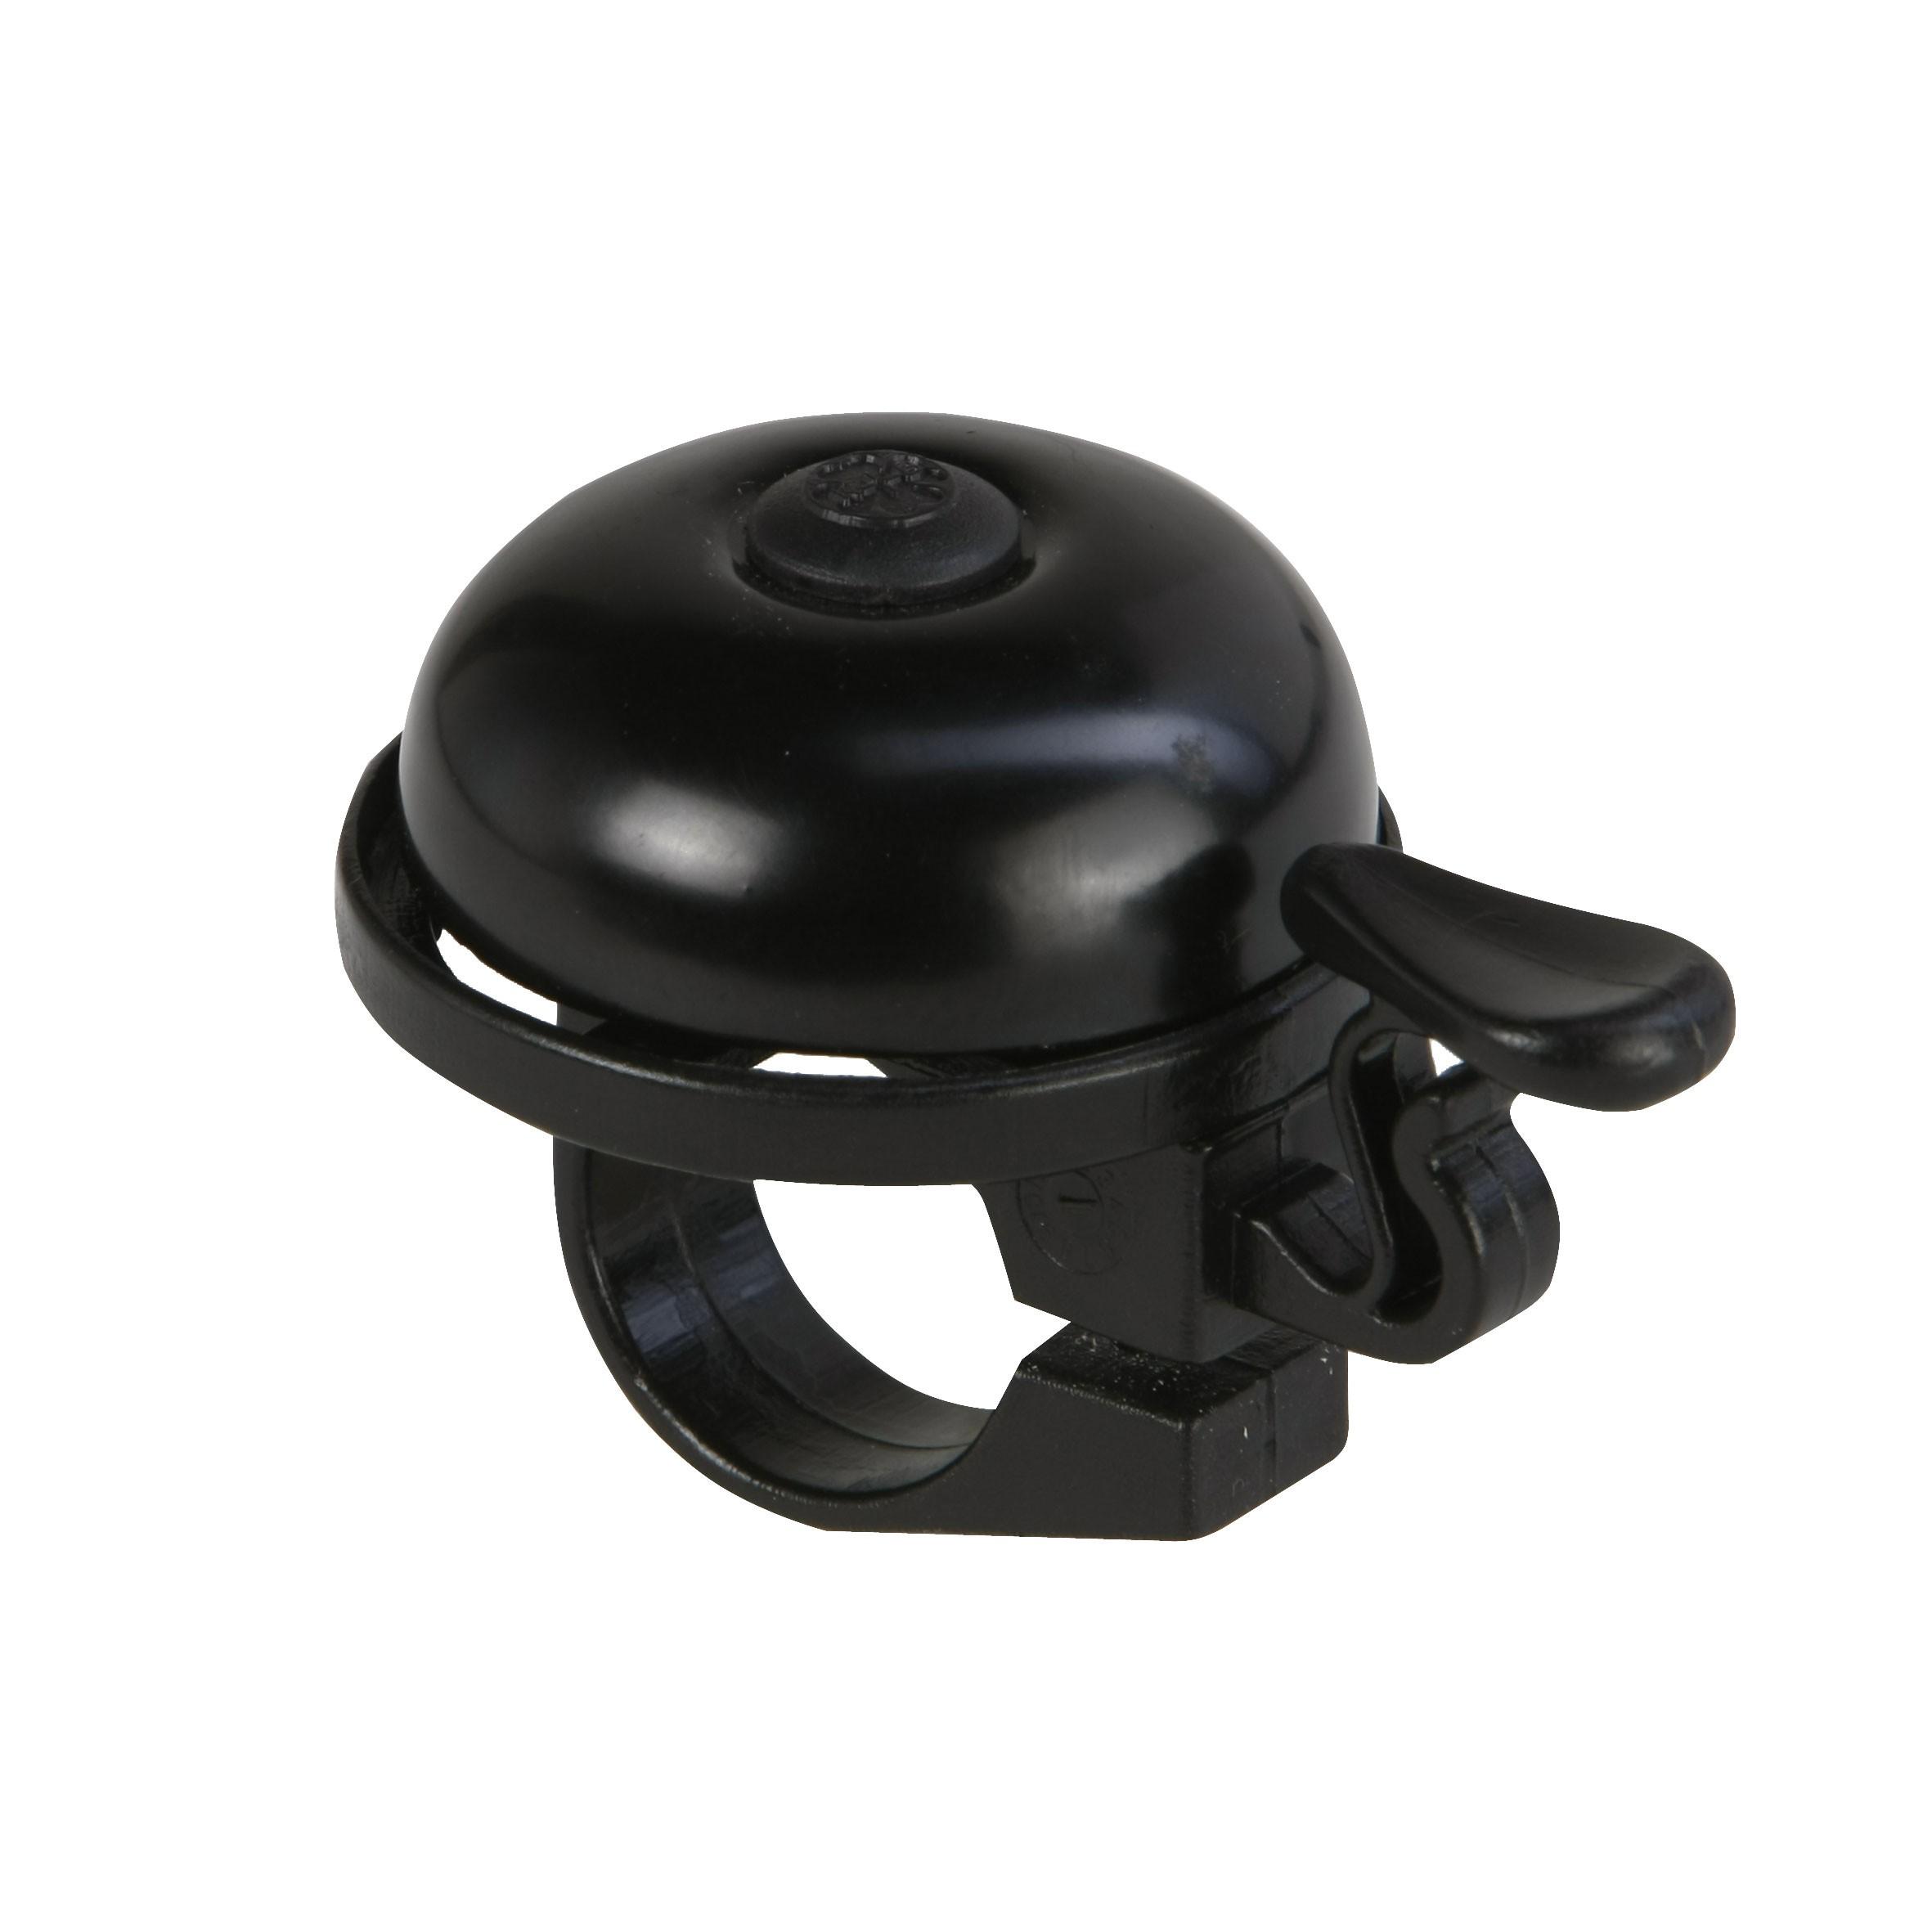 fischer fahrradklingel glocke bei. Black Bedroom Furniture Sets. Home Design Ideas